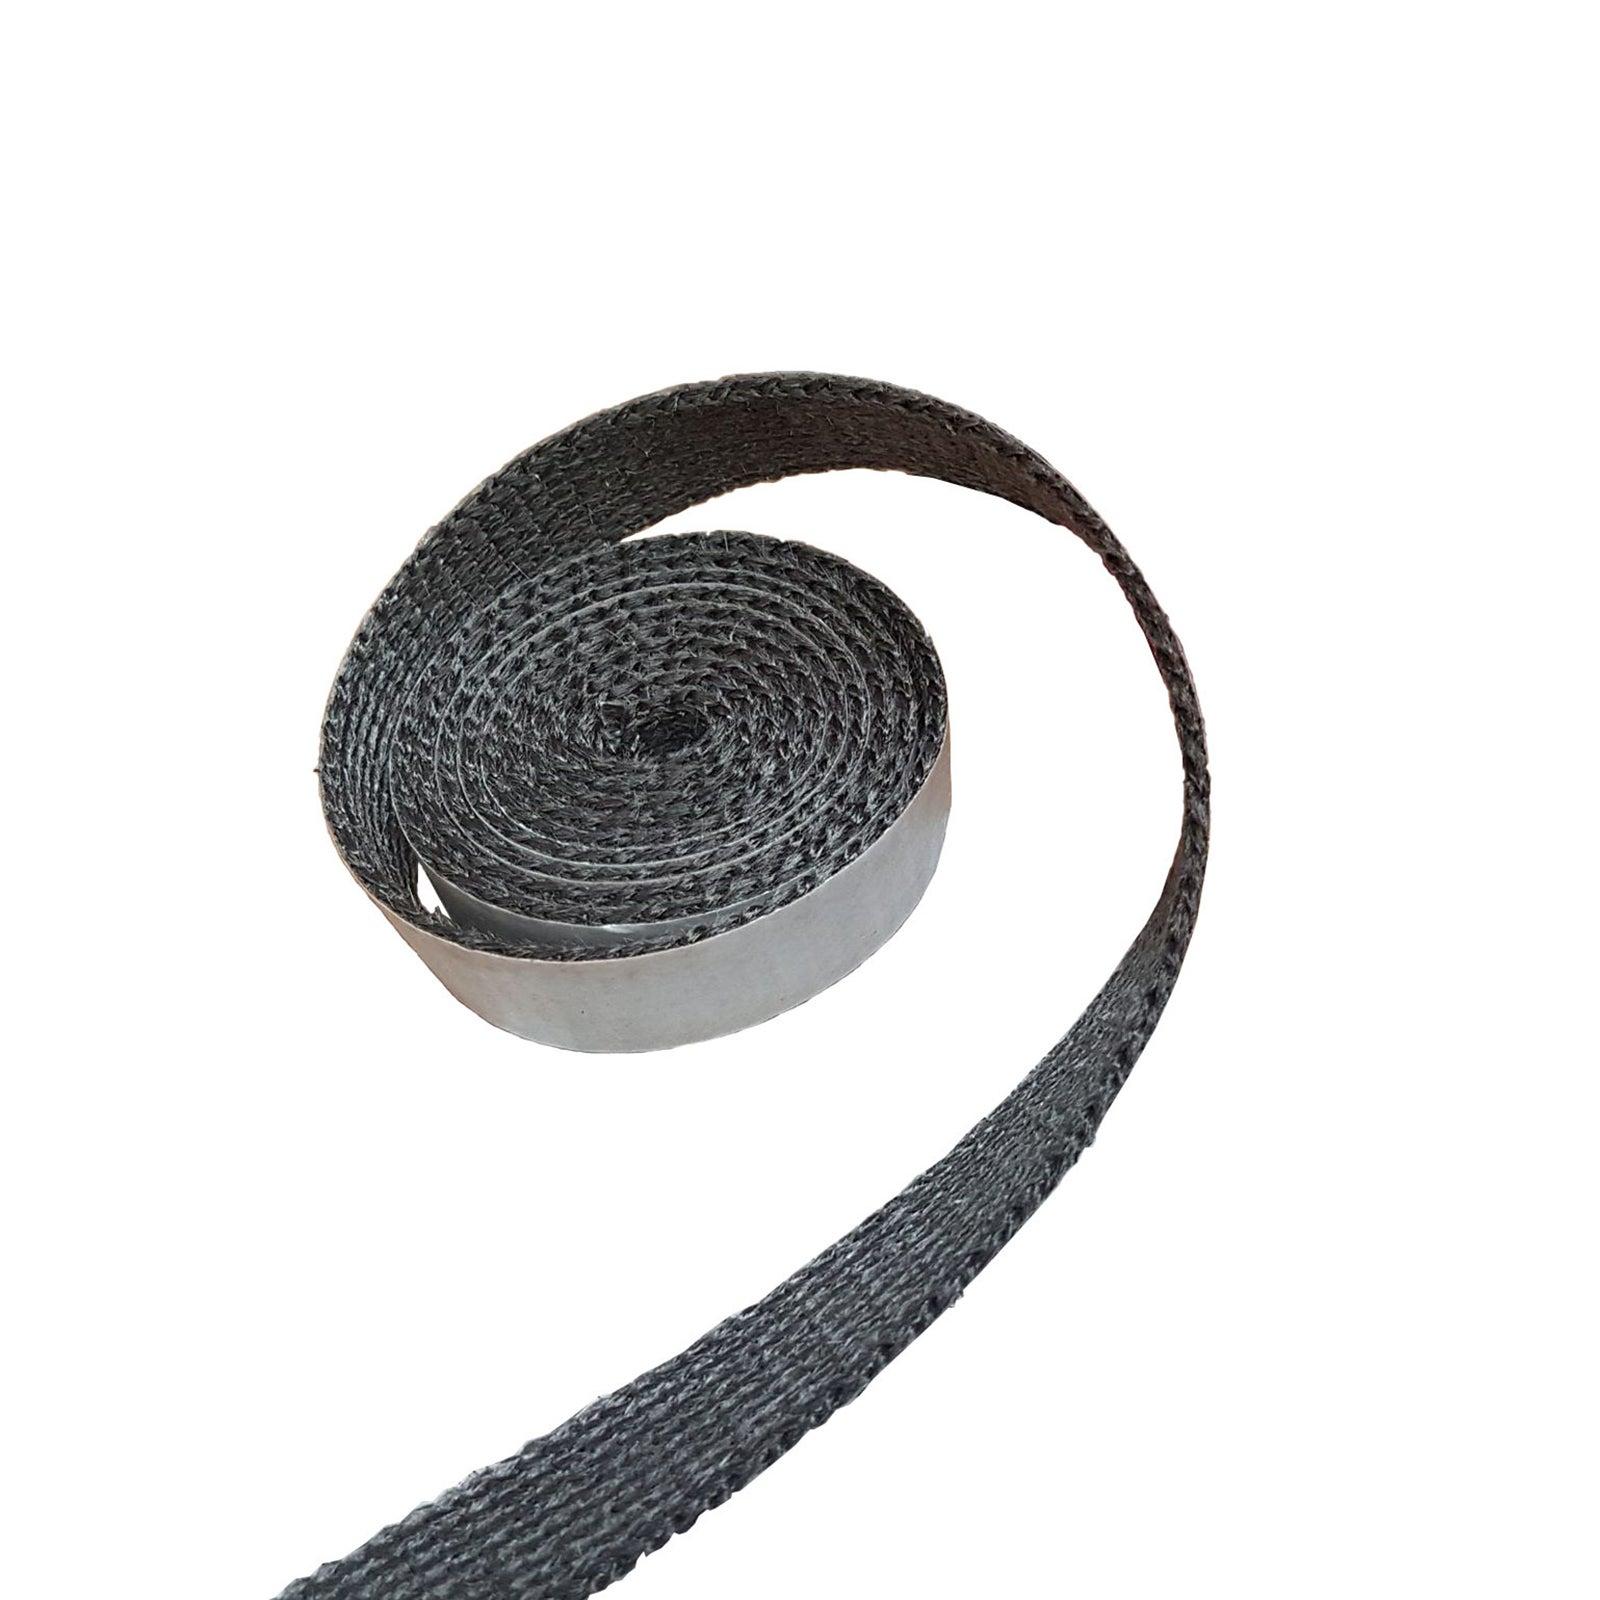 Outdoor Magic - Fibreglass Tape Adhesive Backed - 19mm x 2mm flat x 2 metres